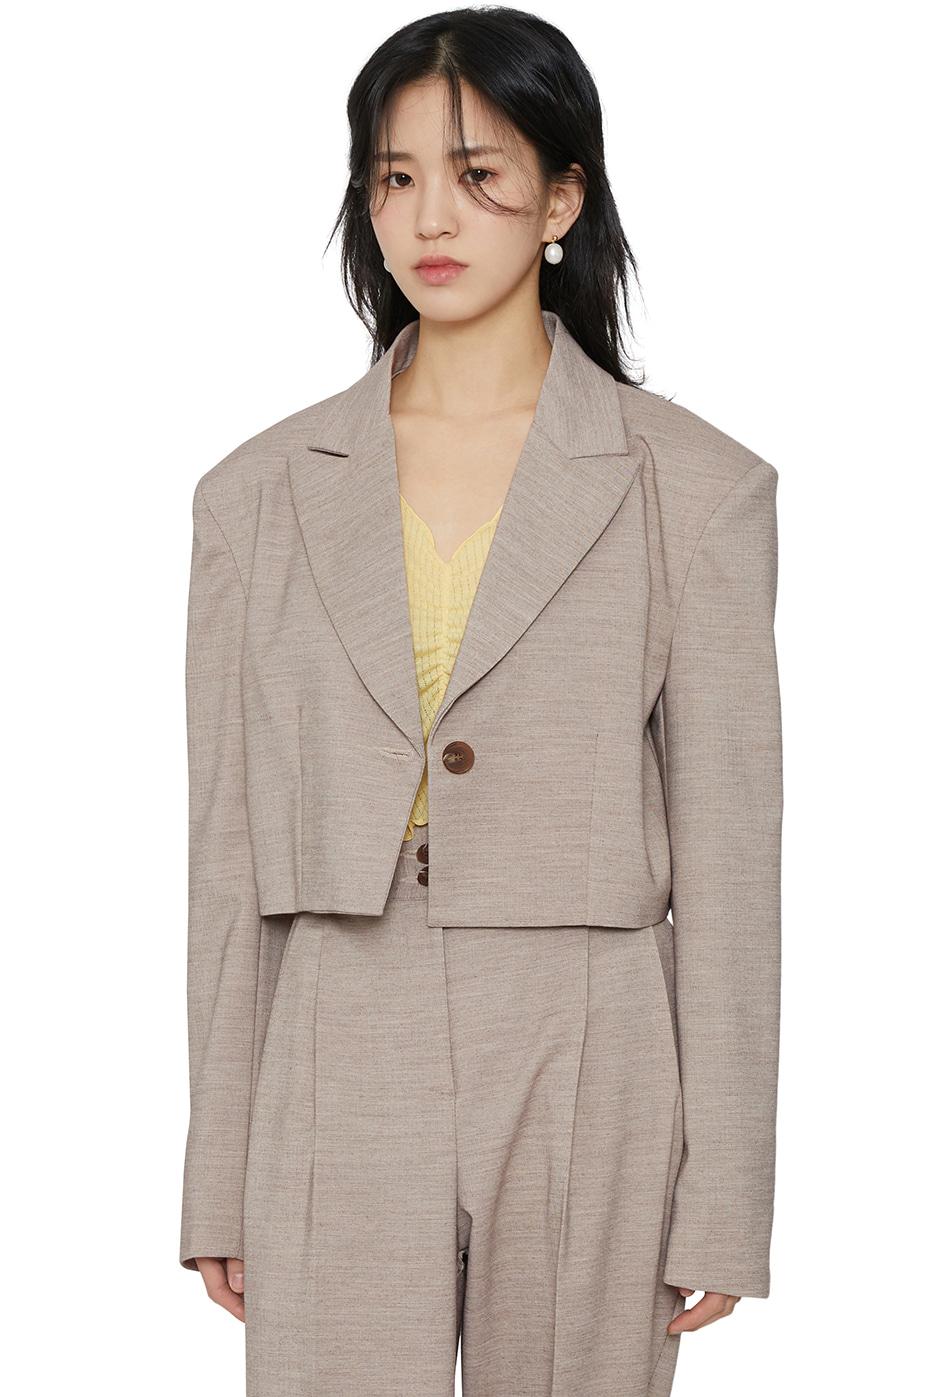 Gauge cropped jacket